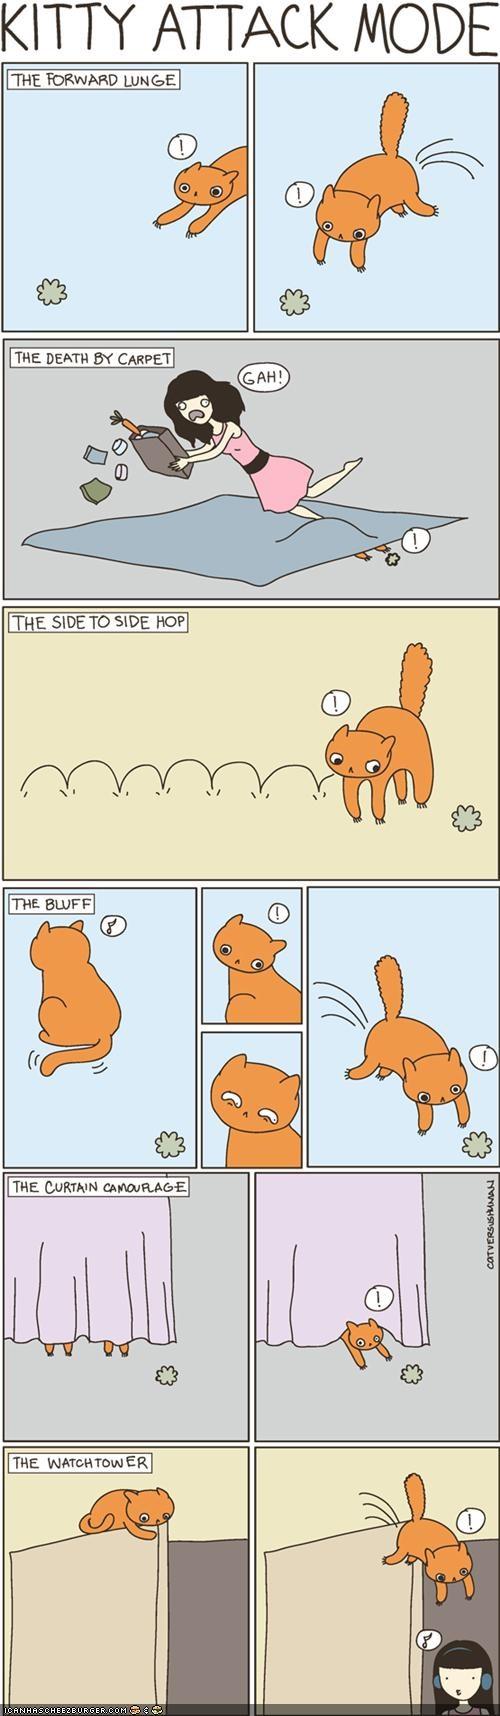 attack cat versus human comic comics - 5412308480